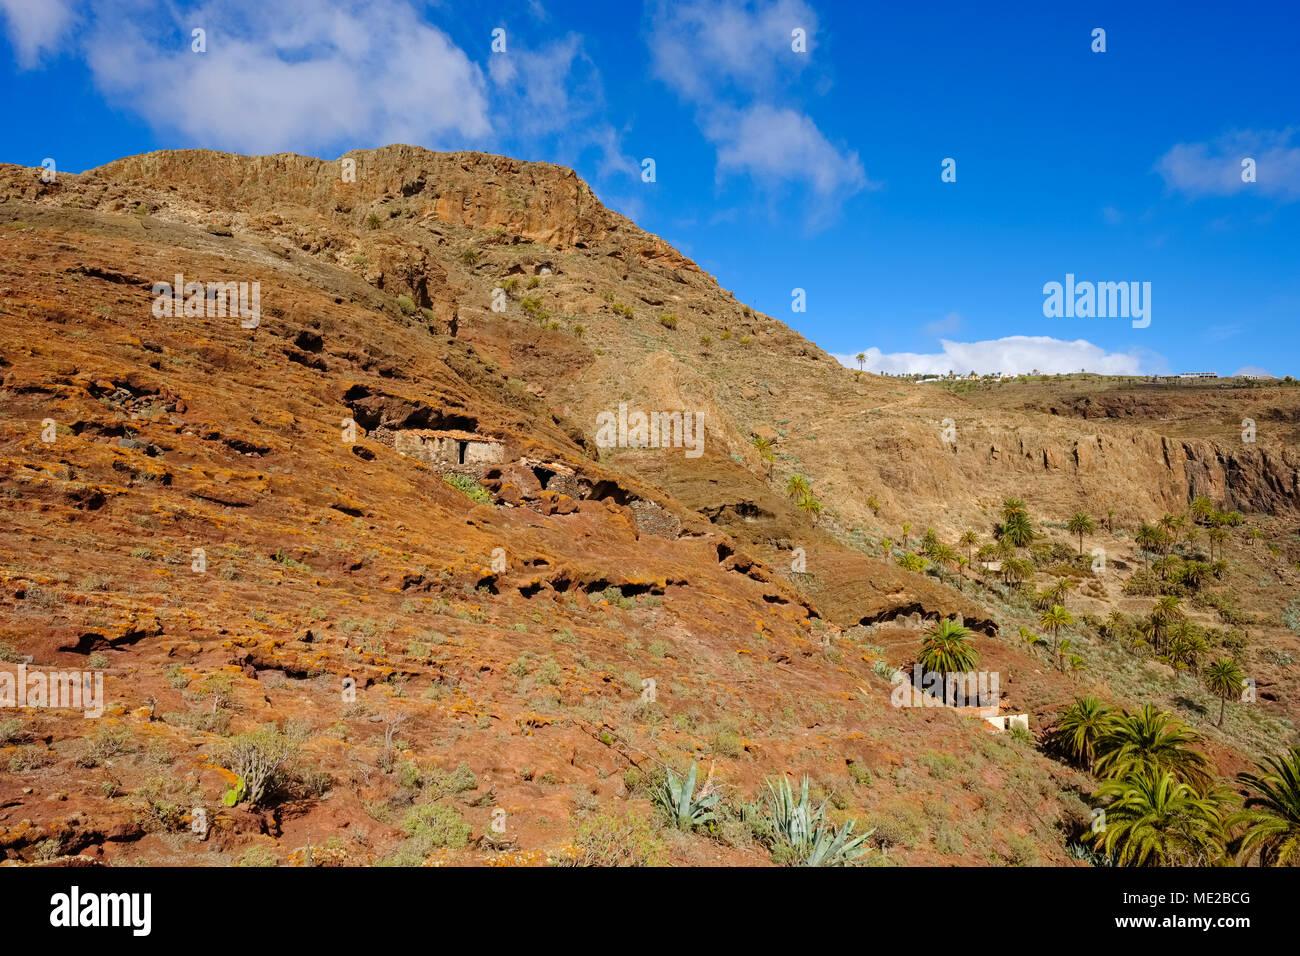 Ancient cave dwelling on Calvario Mountain, Alajero, La Gomera, Canary Islands, Spain - Stock Image